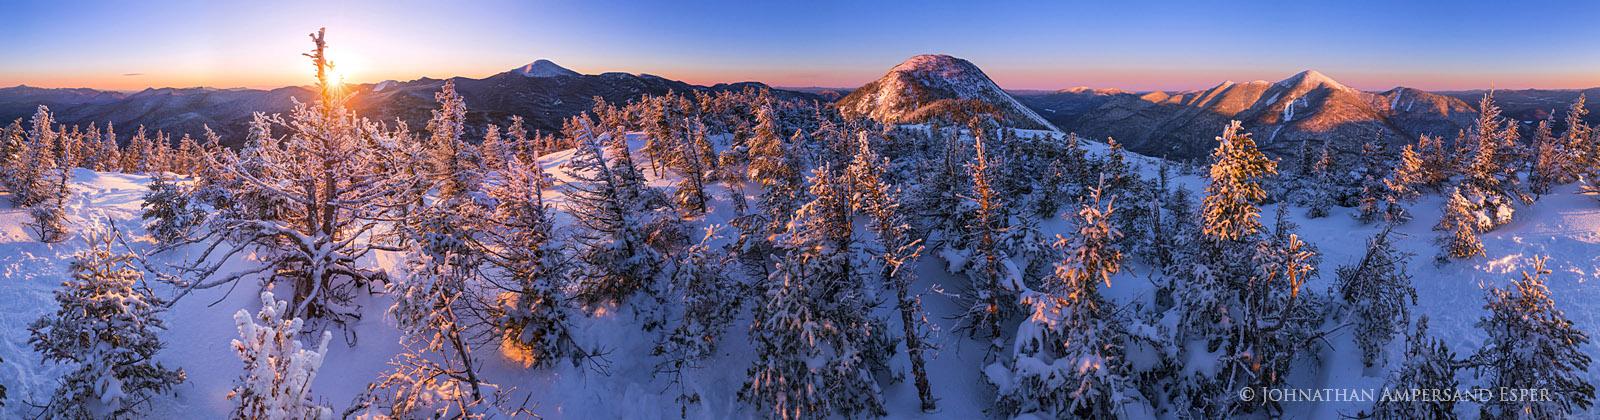 Colden,Mt Colden,High Peaks,Adirondack Mountains,Adirondacks,Adirondack High Peaks,summit,Colden summit,winter,sunrise,360 degree panorama,alpenglow,Johnathan Esper, 2017,Algonquin,, photo